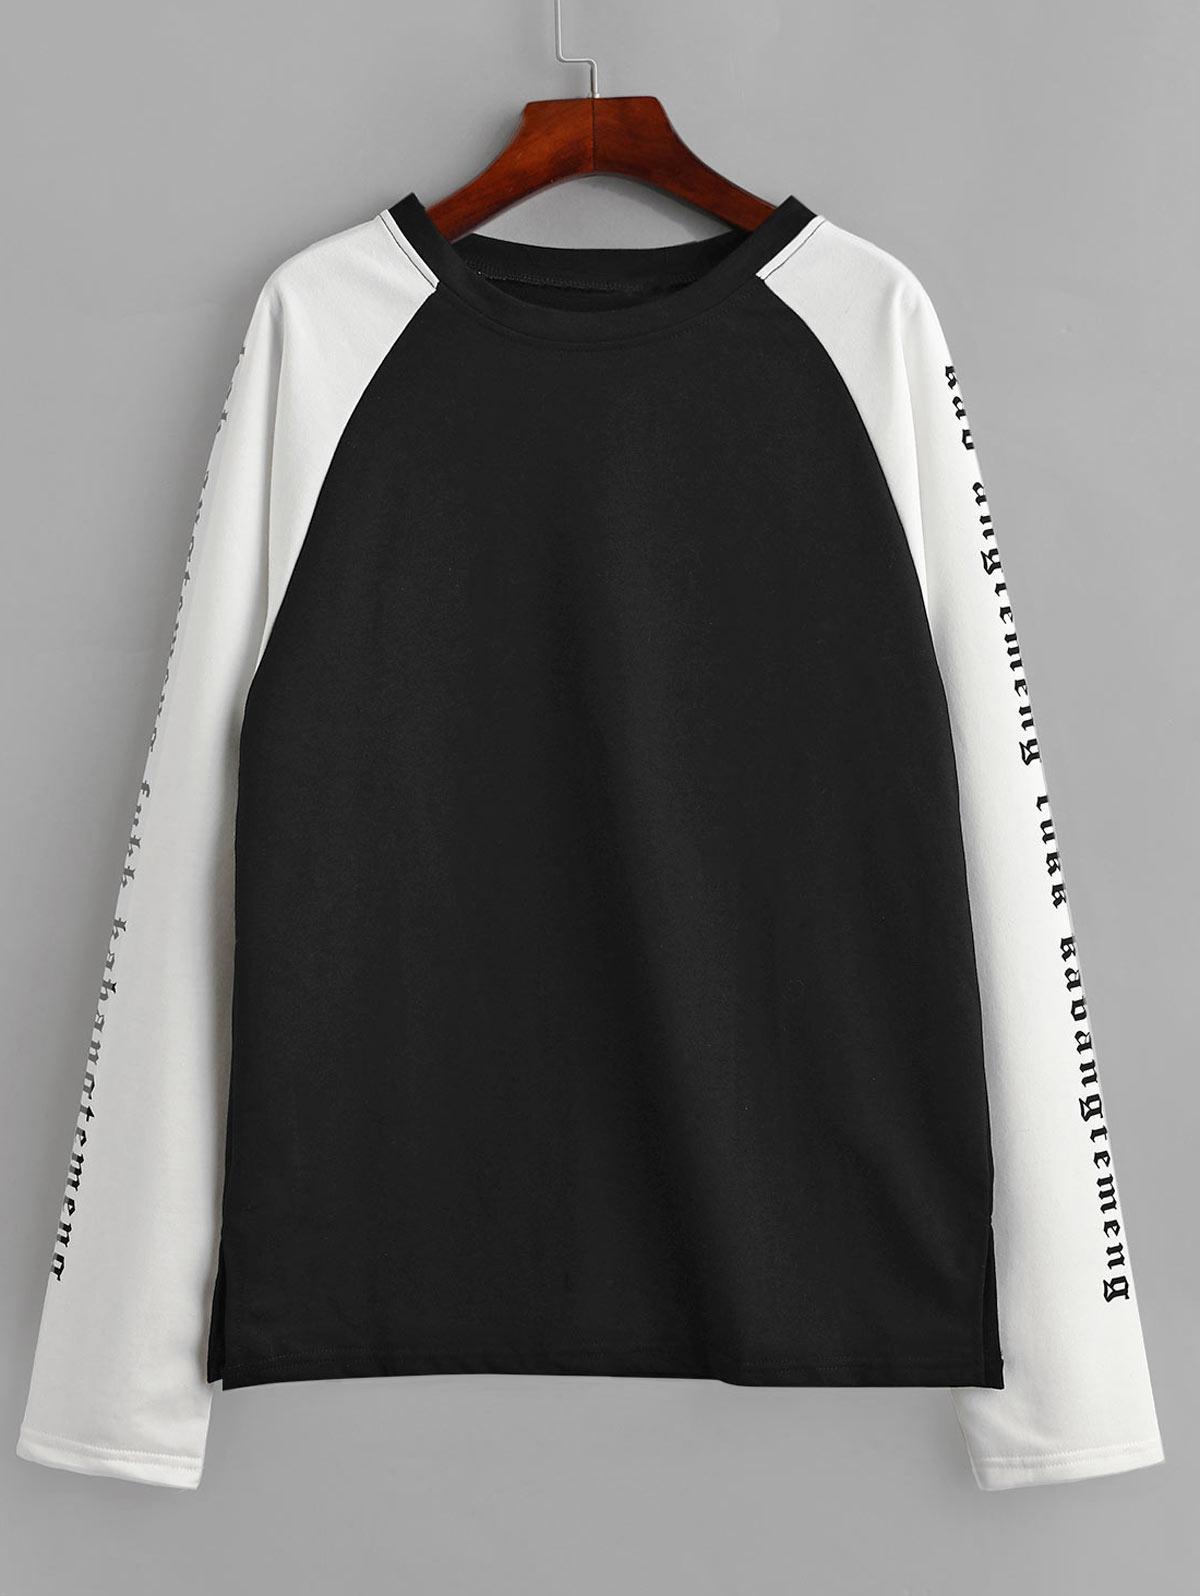 Raglan Sleeve Colorblock Slogan Graphic Sweatshirt